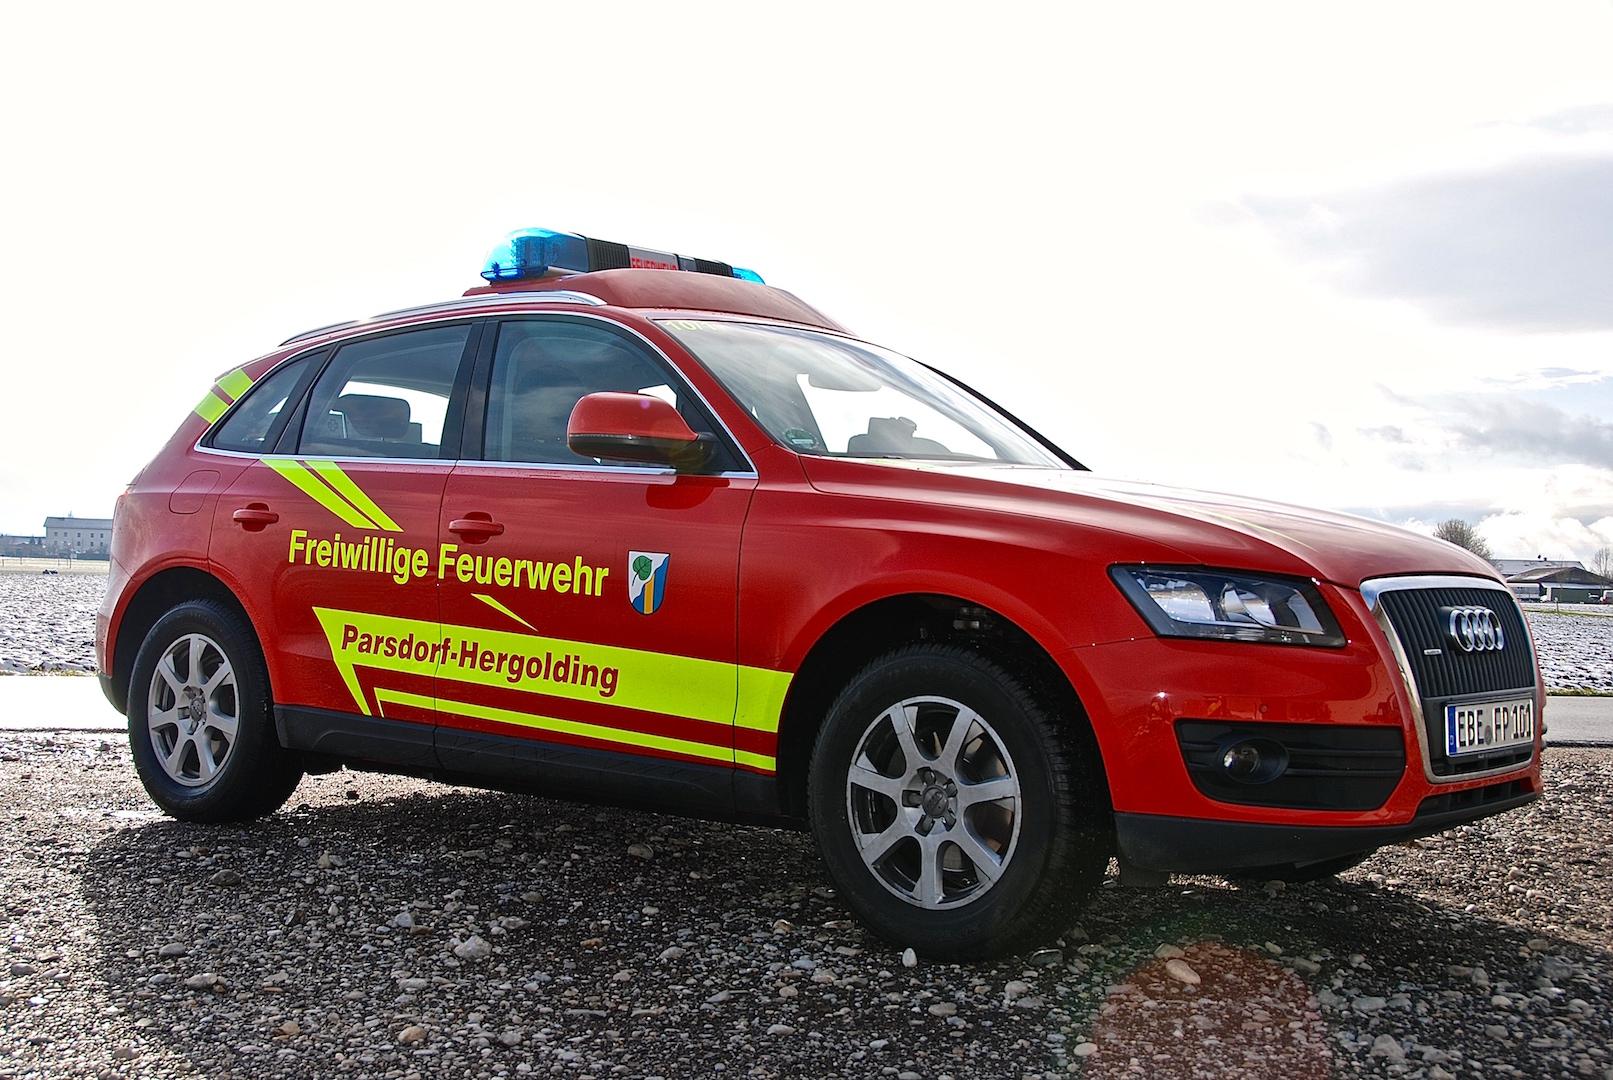 Feuerwehr Parsdorf Hergolding Kdow